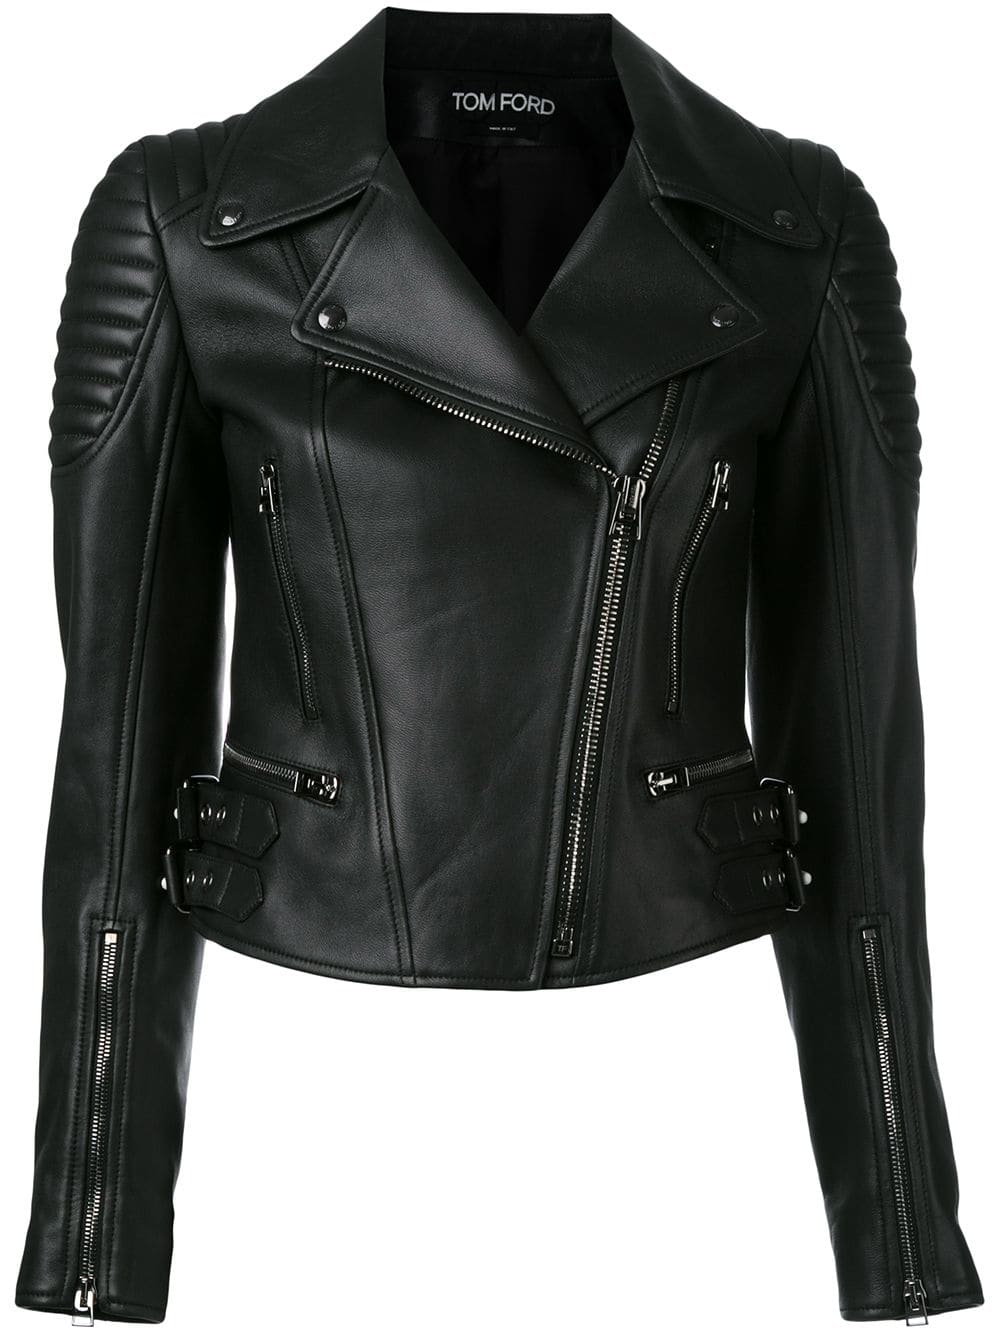 Tom Ford Leather Biker Jacket in 2019 | Lederjacke frauen